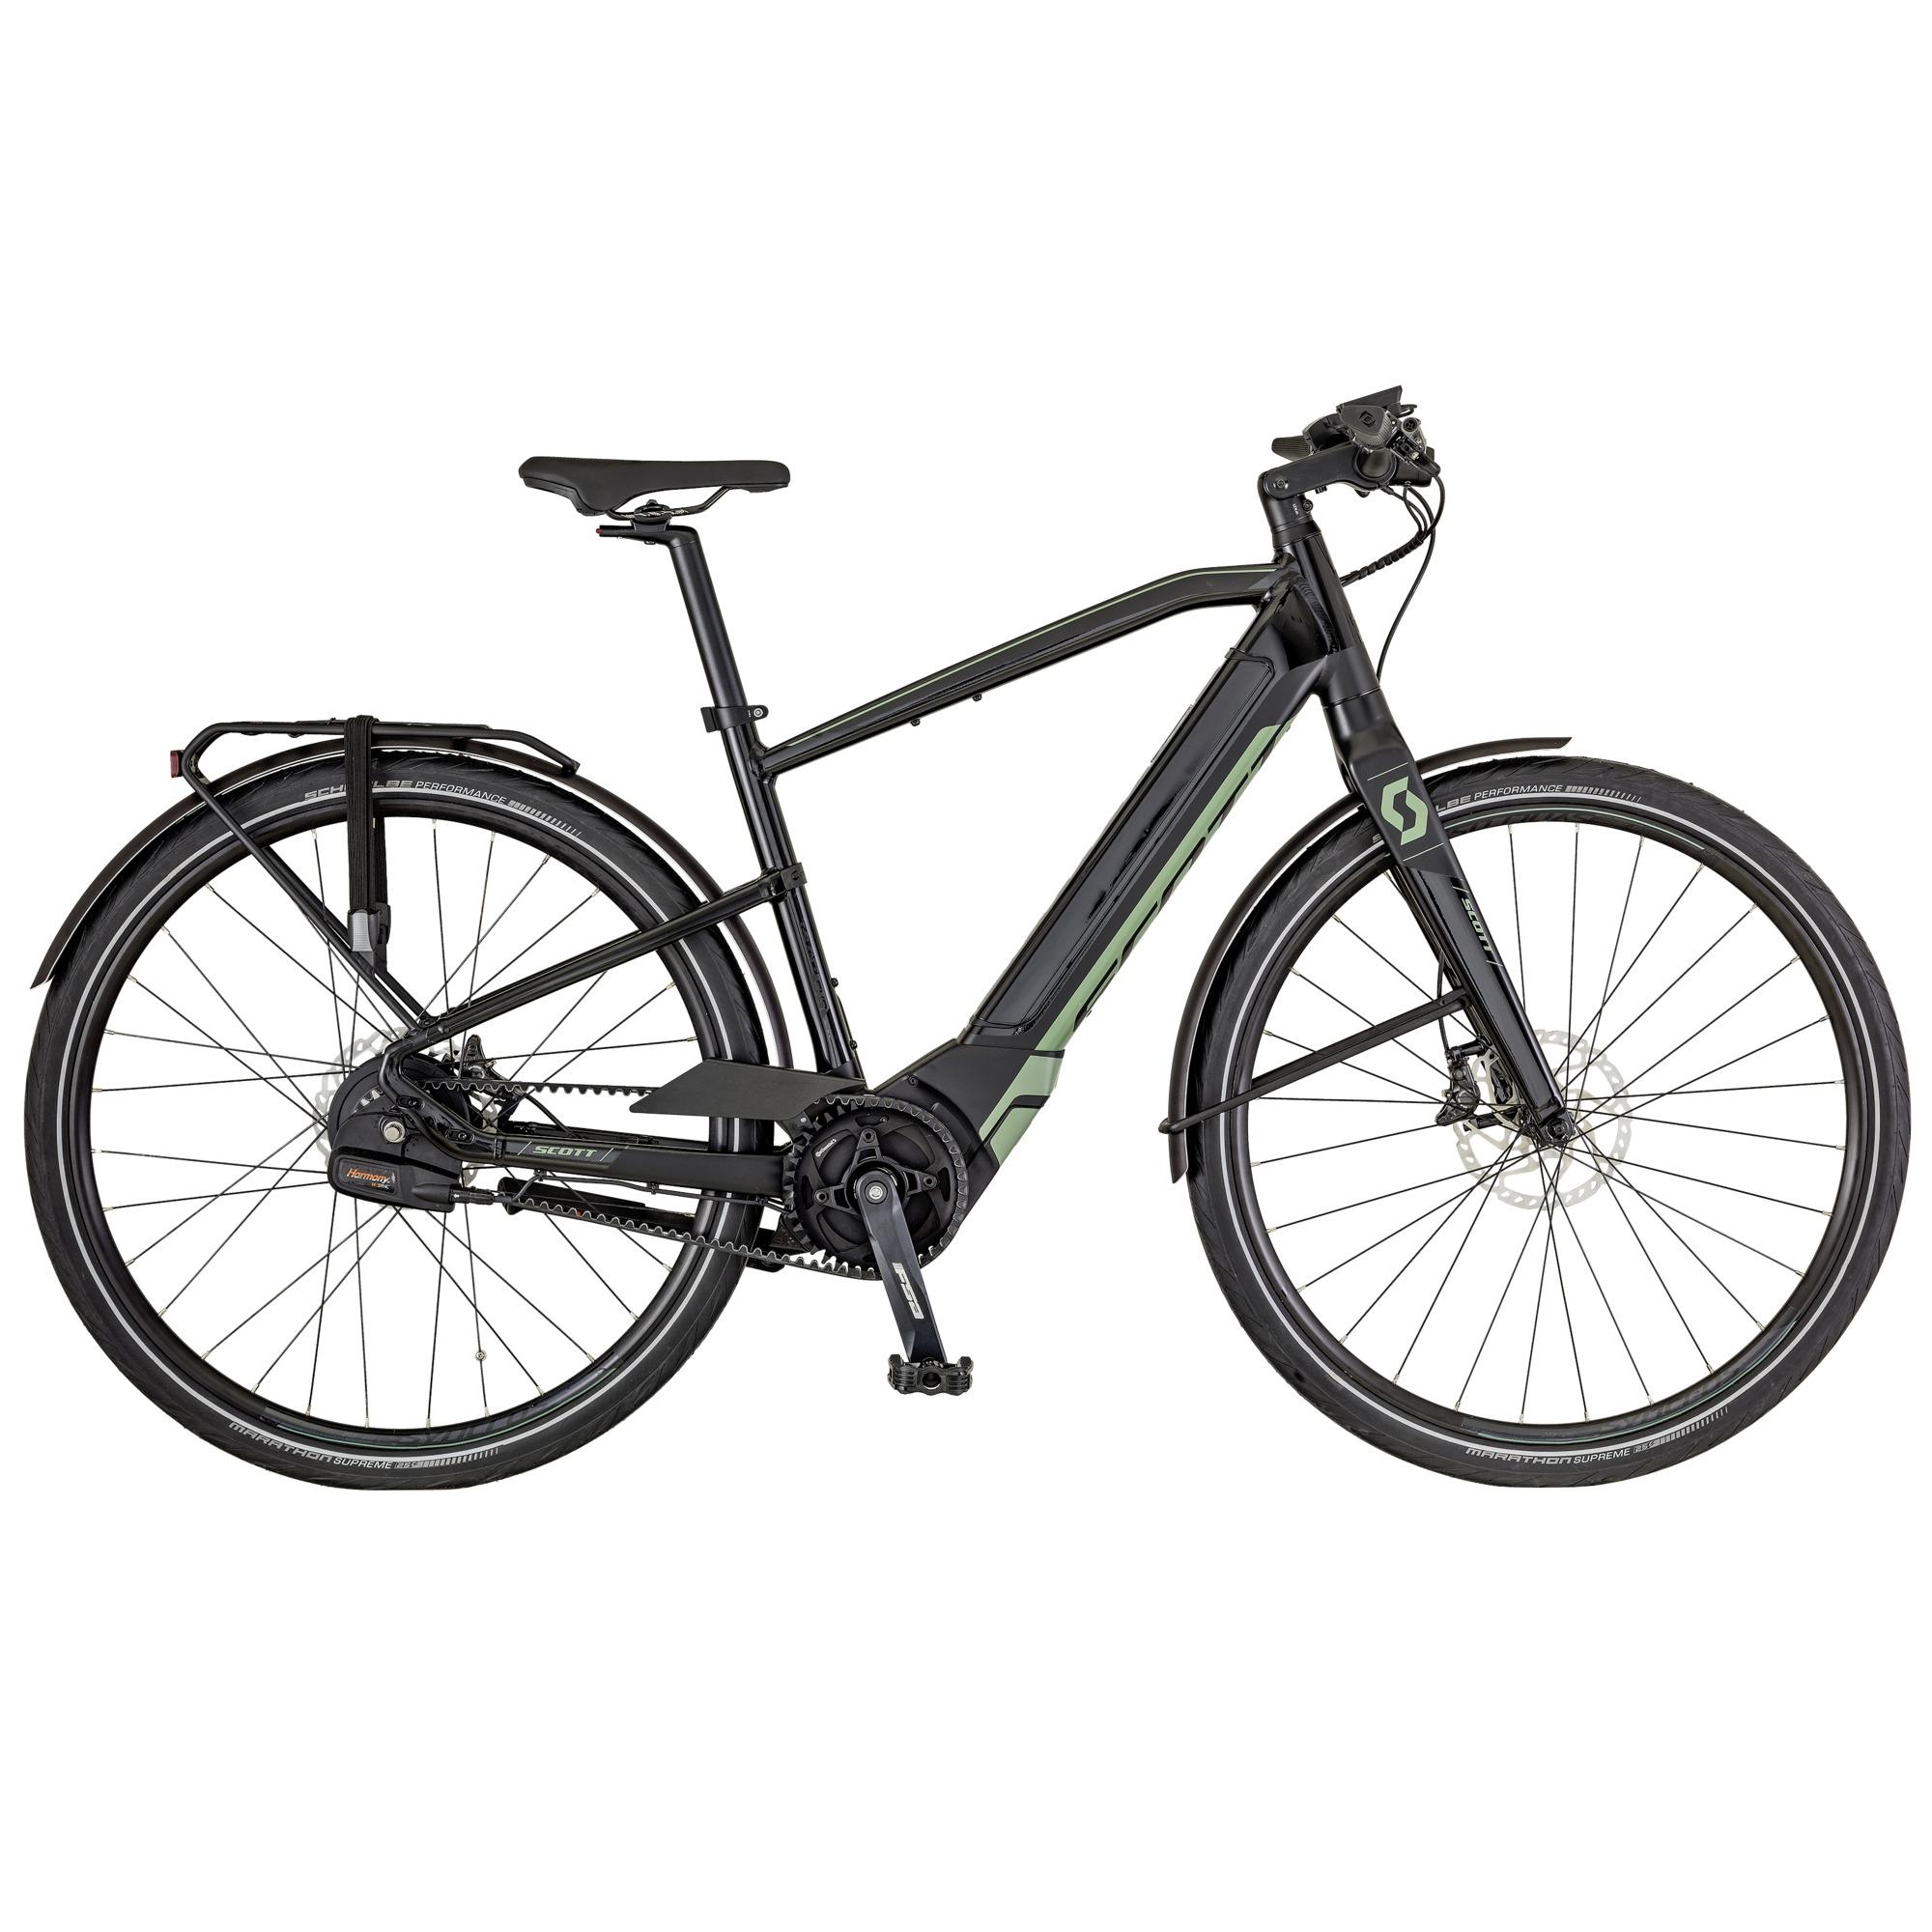 SCOTT E-Silence Evo Bike L - Zweirad Homann